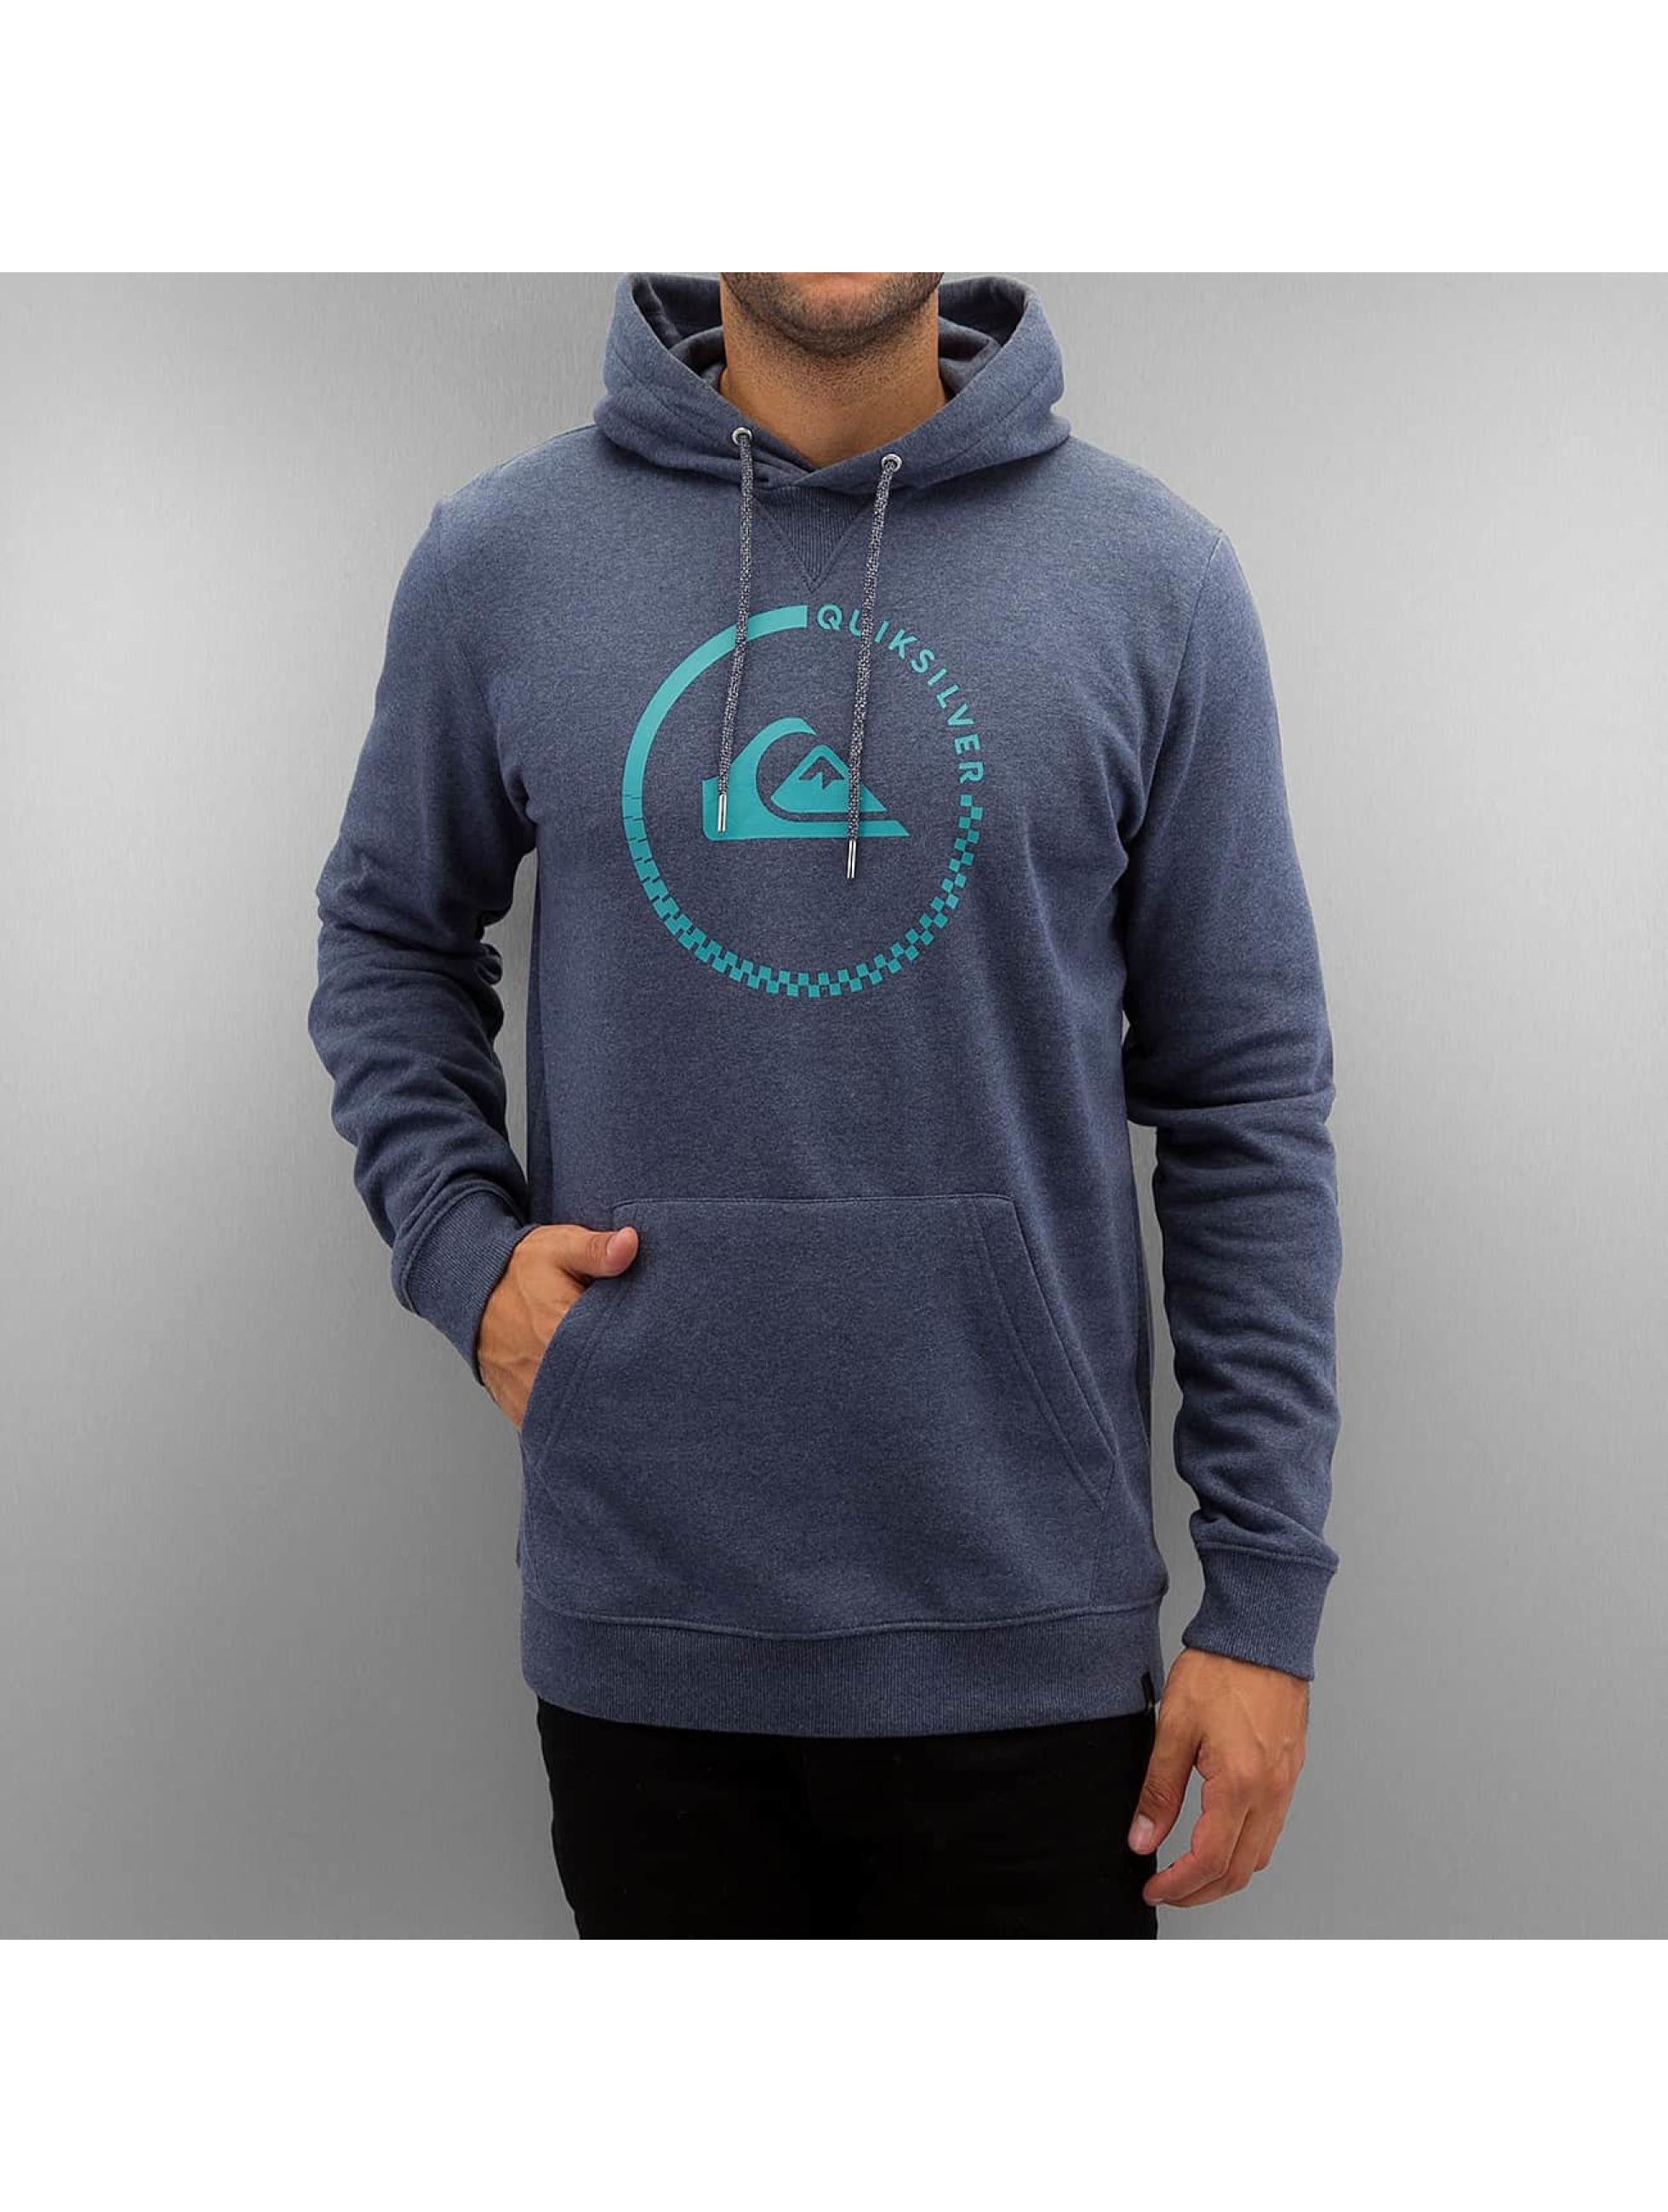 Quiksilver Hoody Big Logo blau